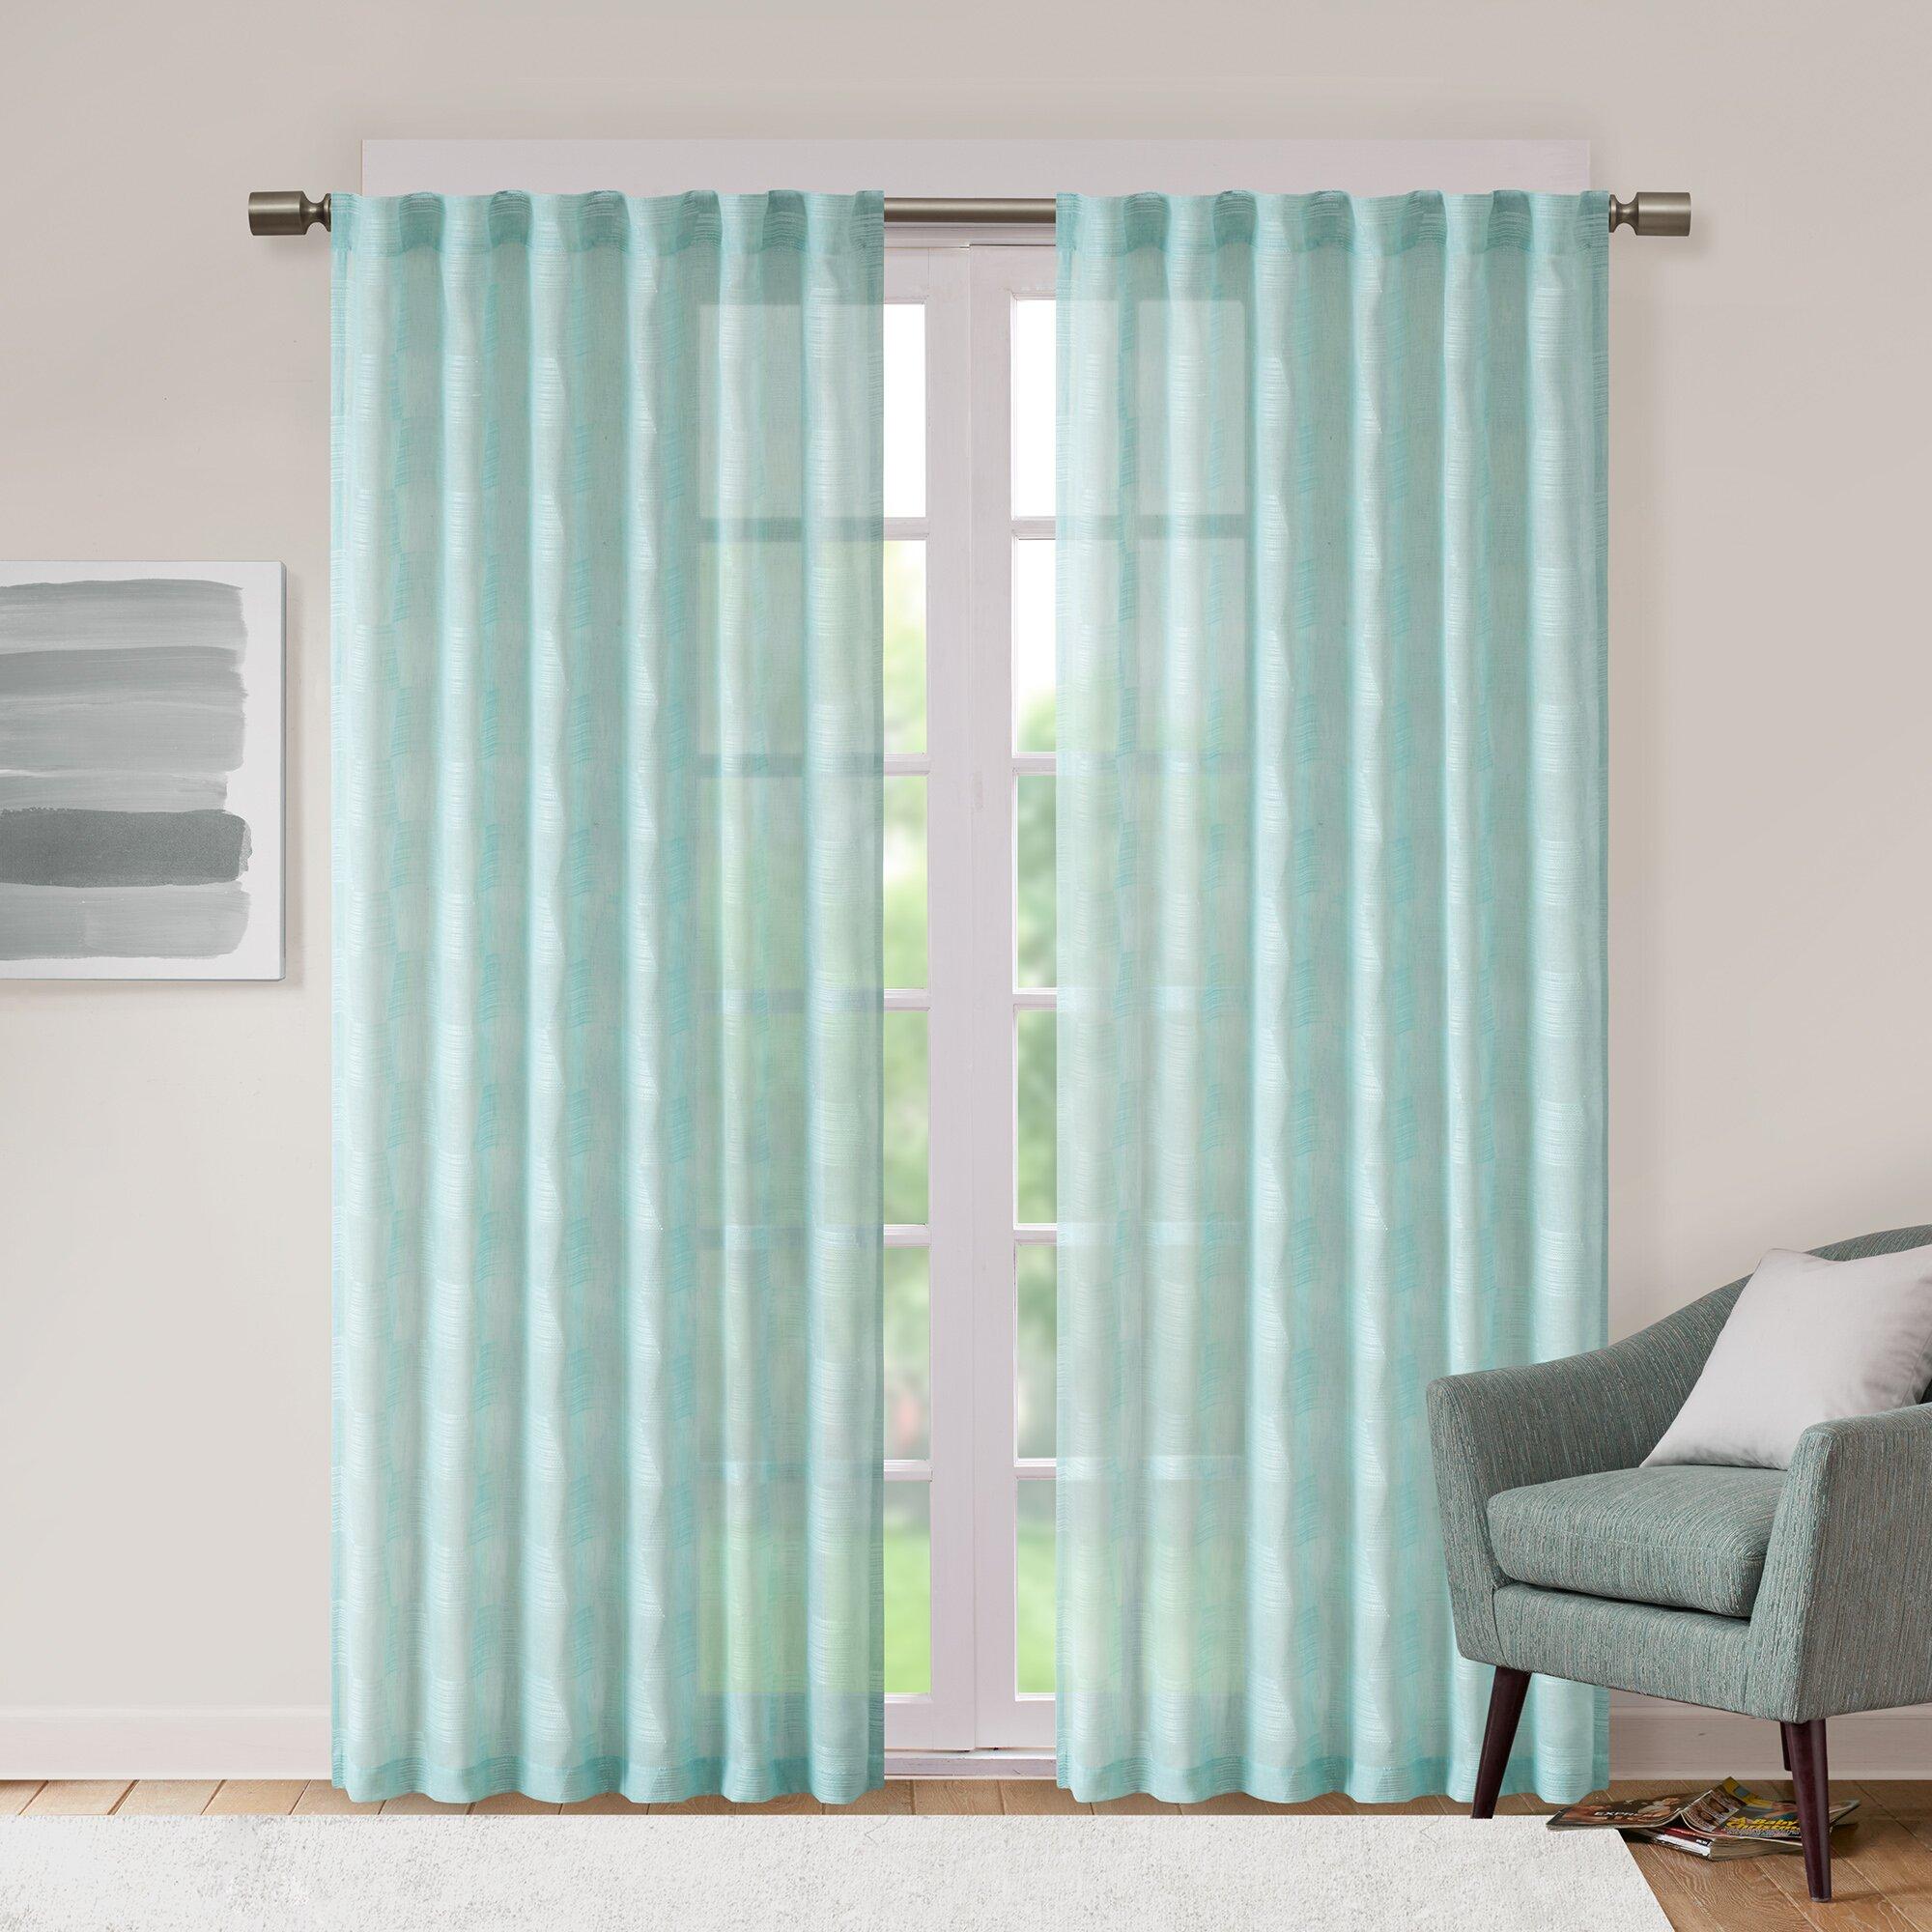 Belchertown Jacquard Geometric Sheer Tab Top Single Curtain Panel Joss Main